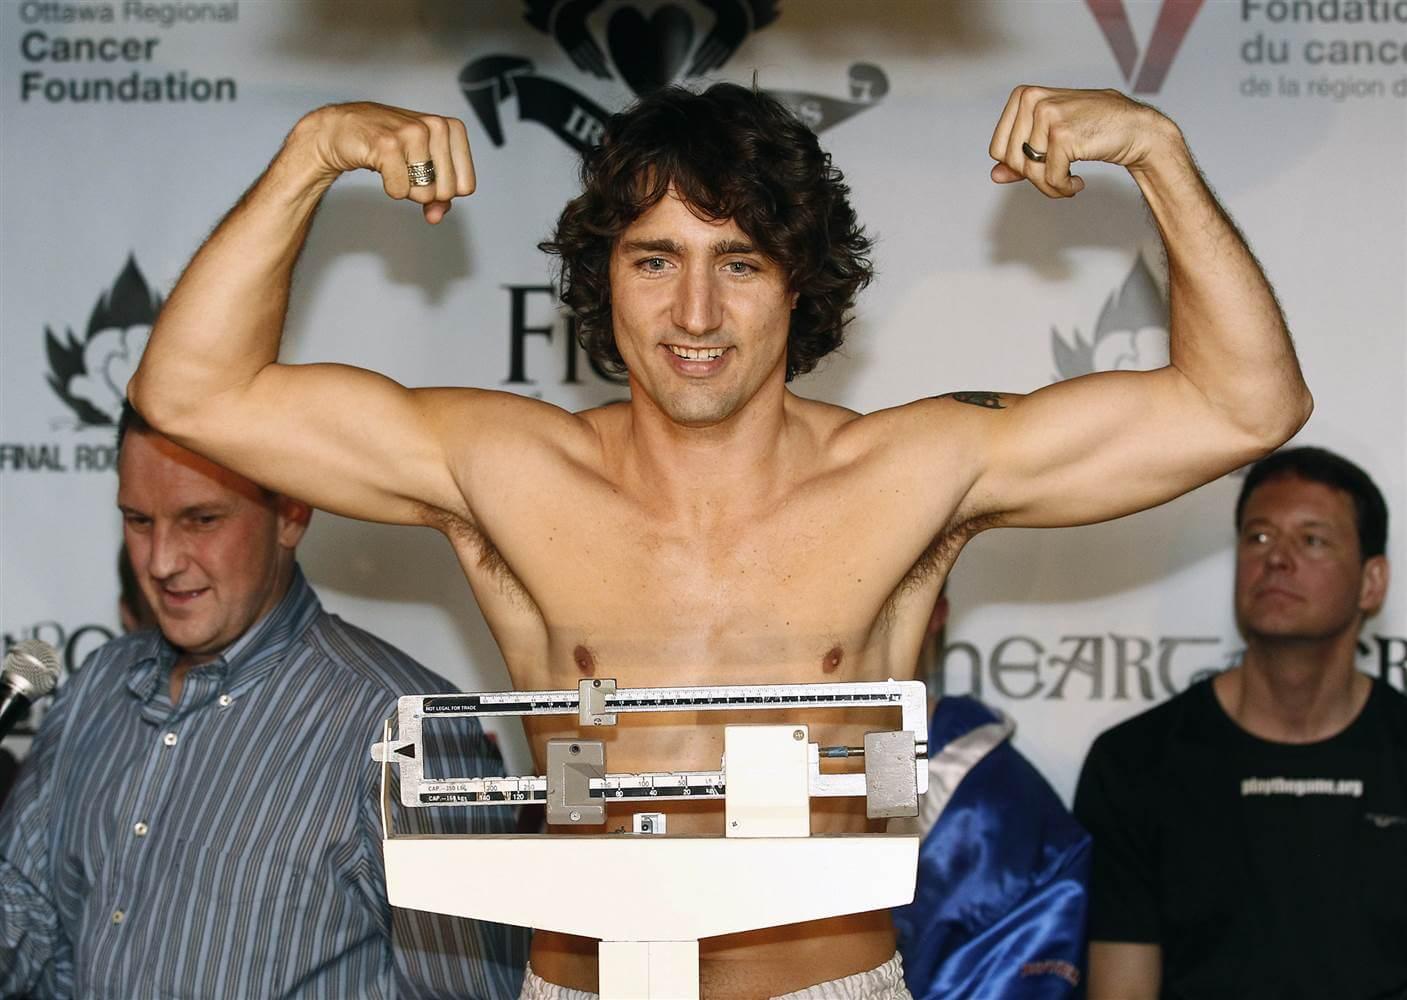 Justin Trudeau w 2012. Fot. Chris Wattie / Facebook.com